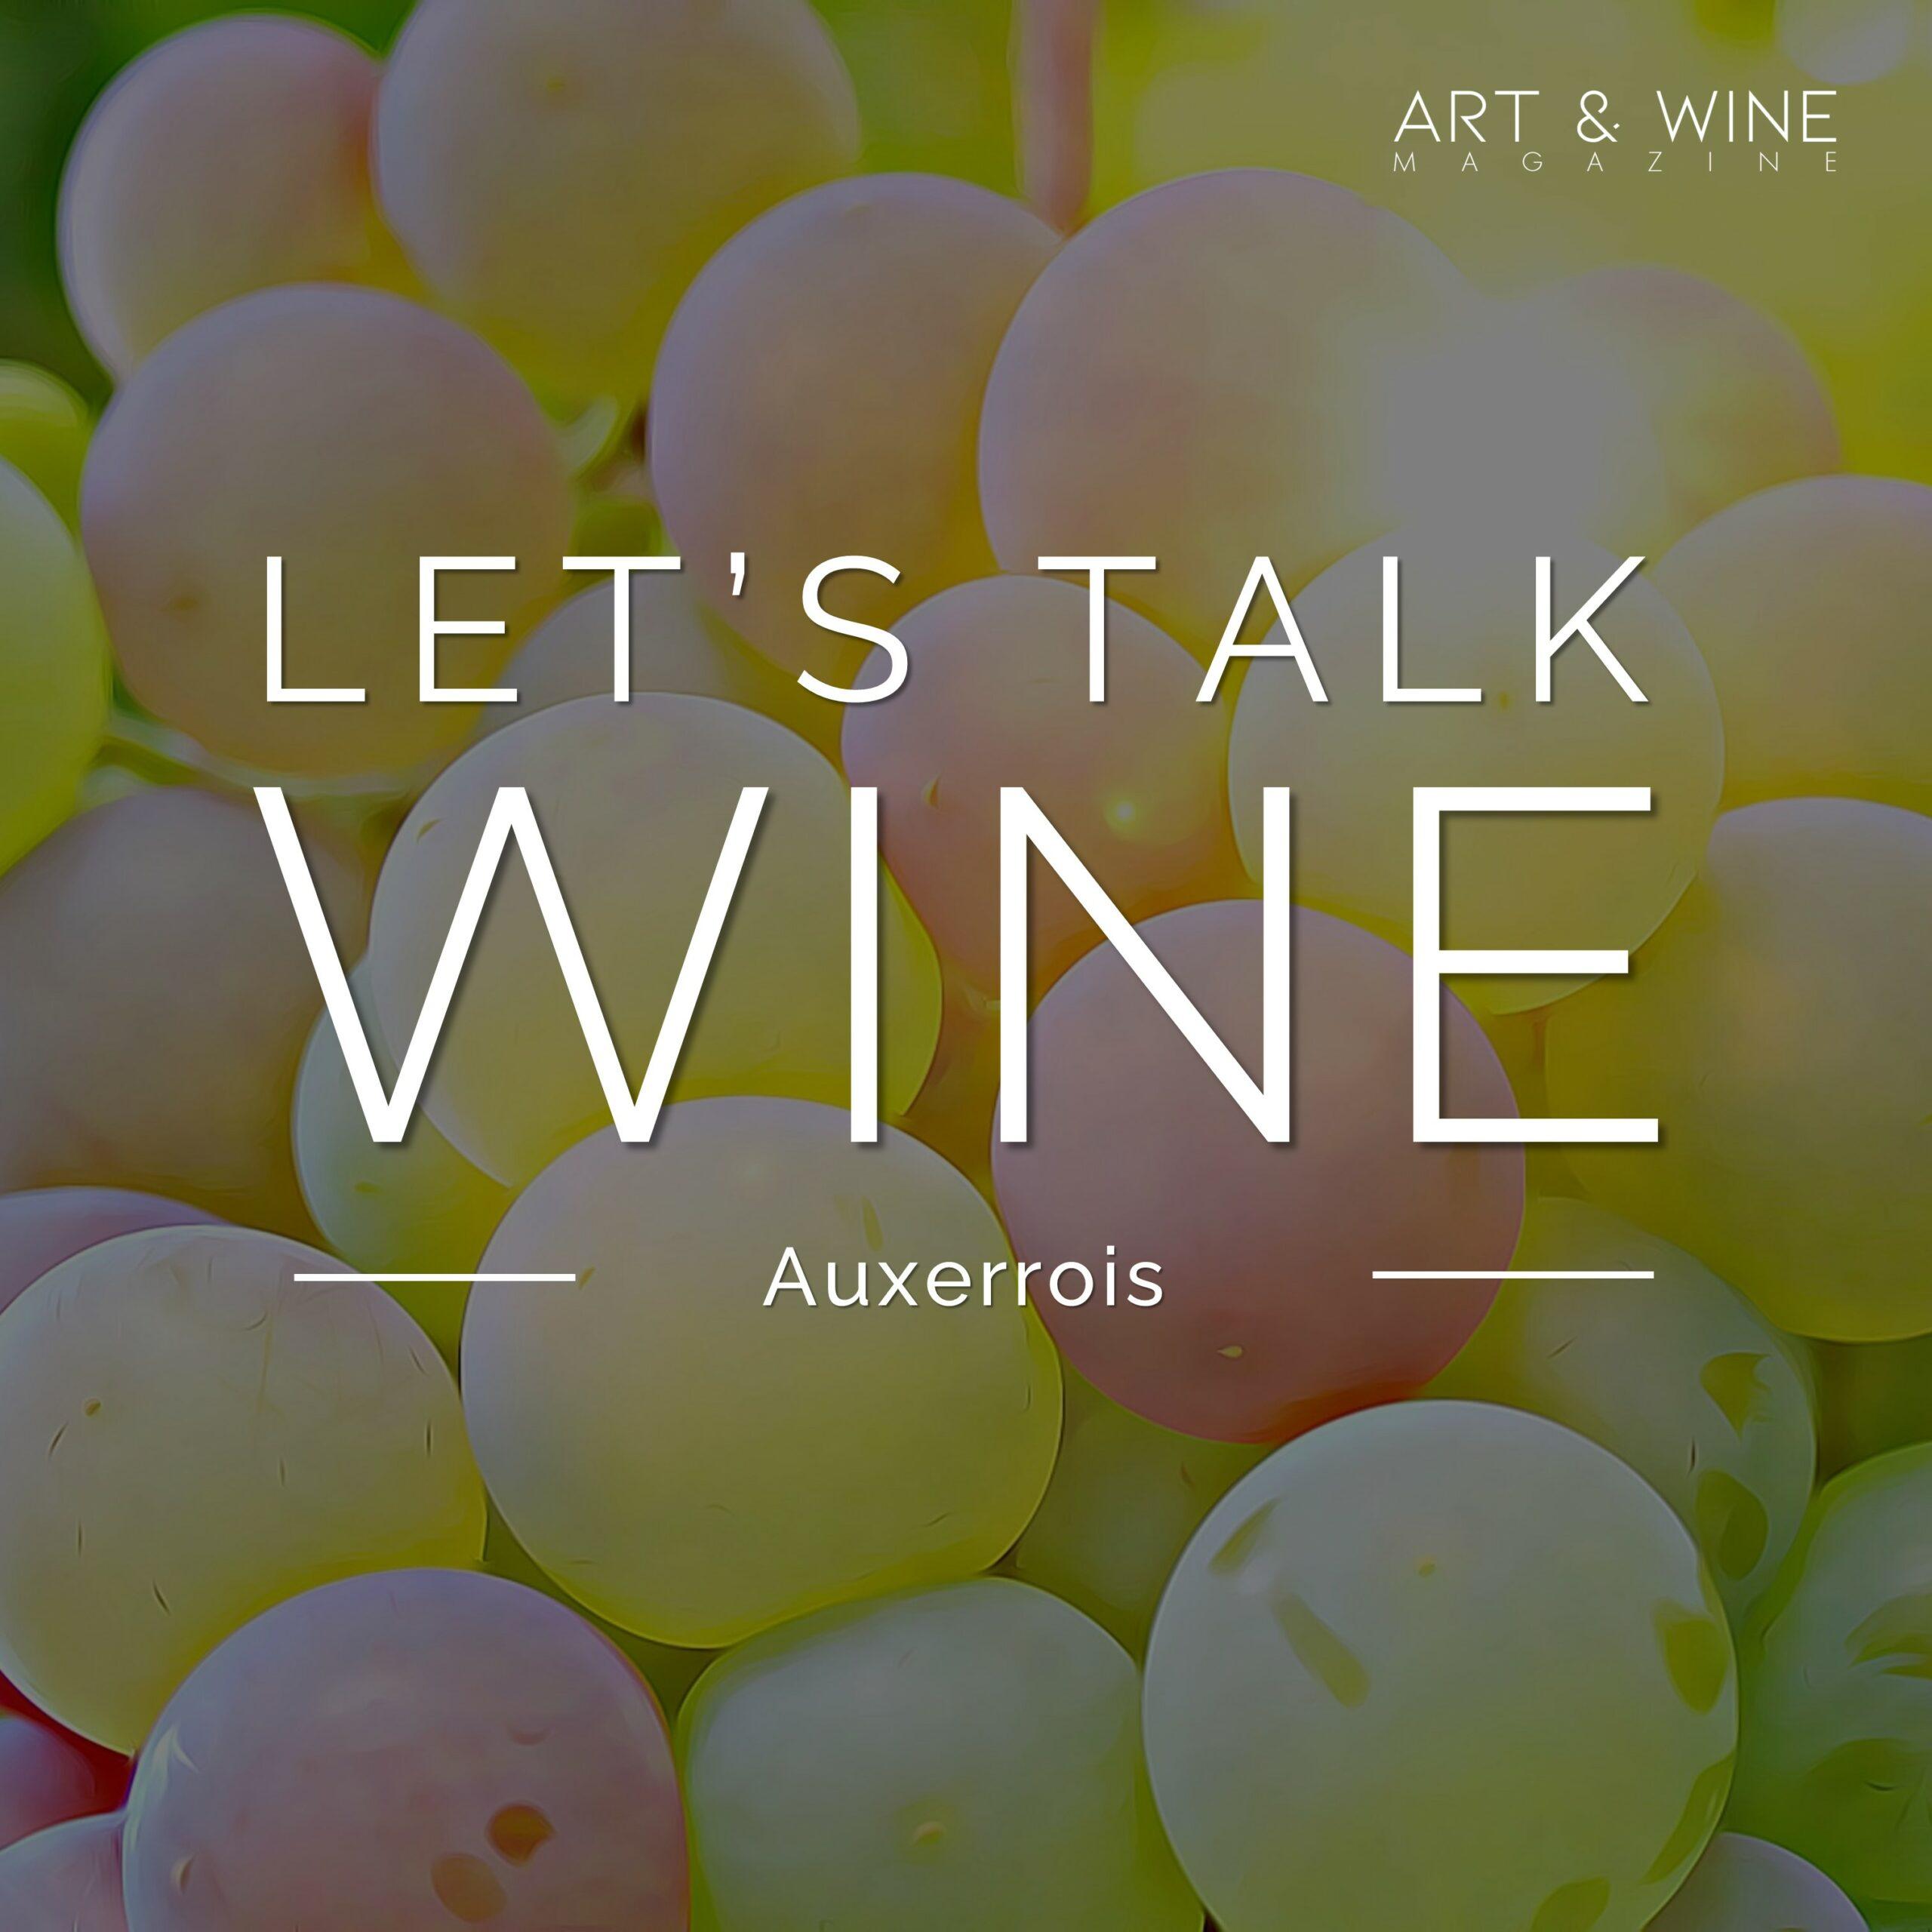 Let's talk Wine Auxerrois Jana Hauck Podcast